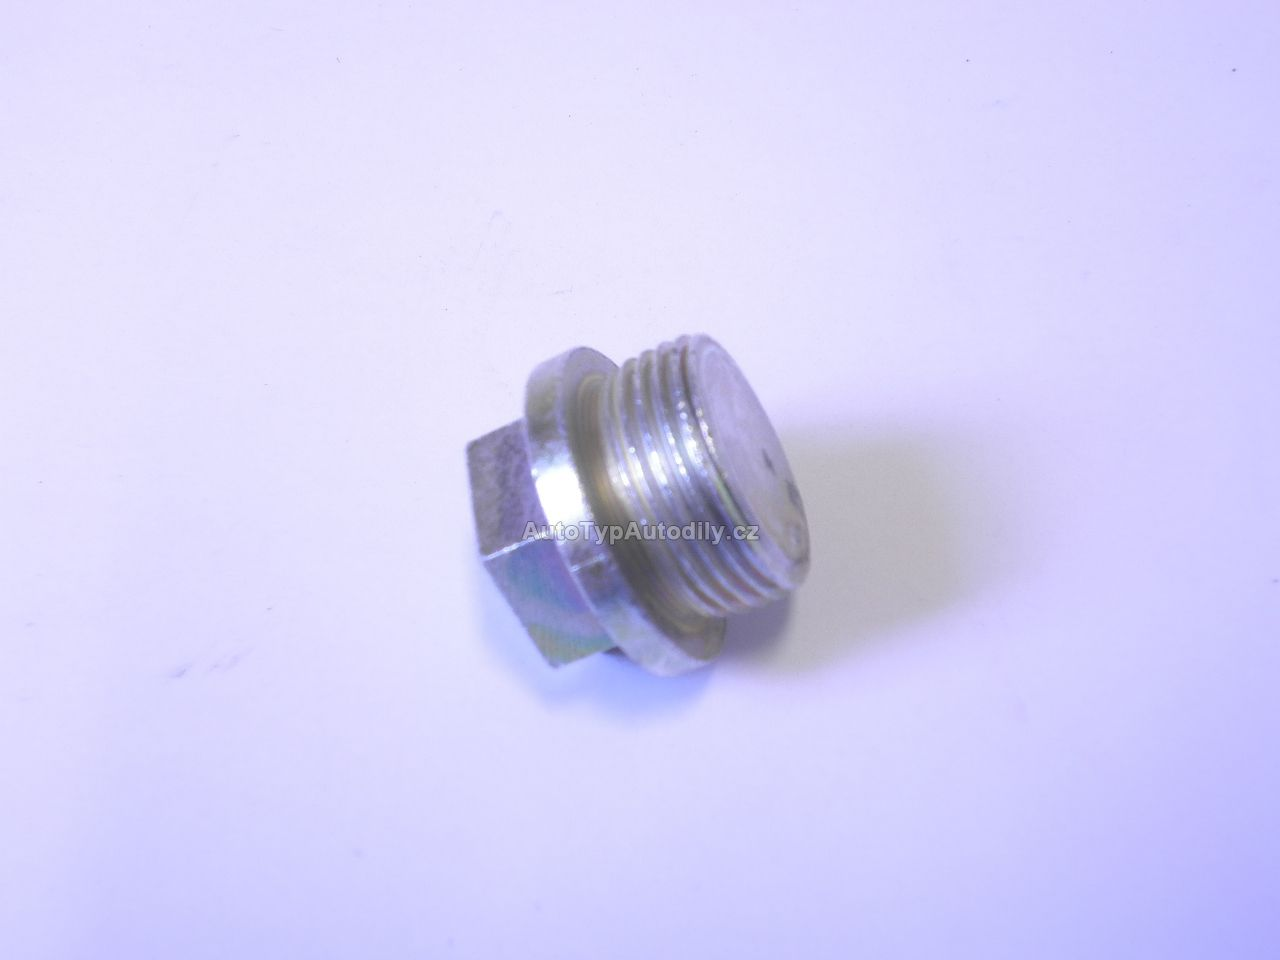 www.autotypautodily.cz Šroub M22 výpustný olejové vany: 113-004690 CZ